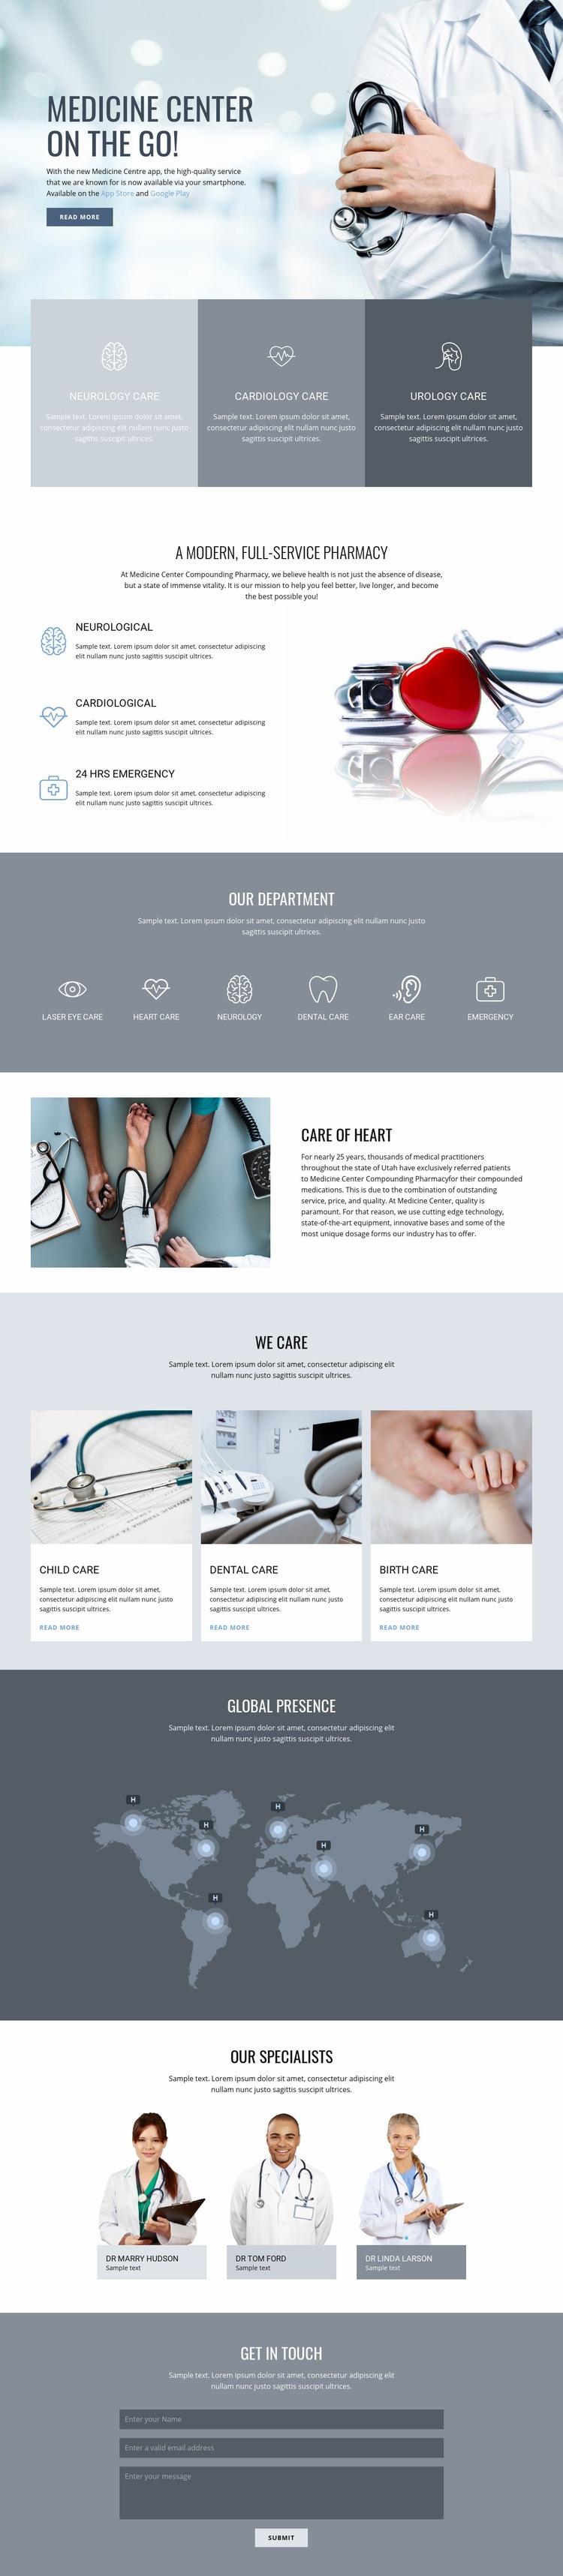 Center of quality medicine Html Code Example